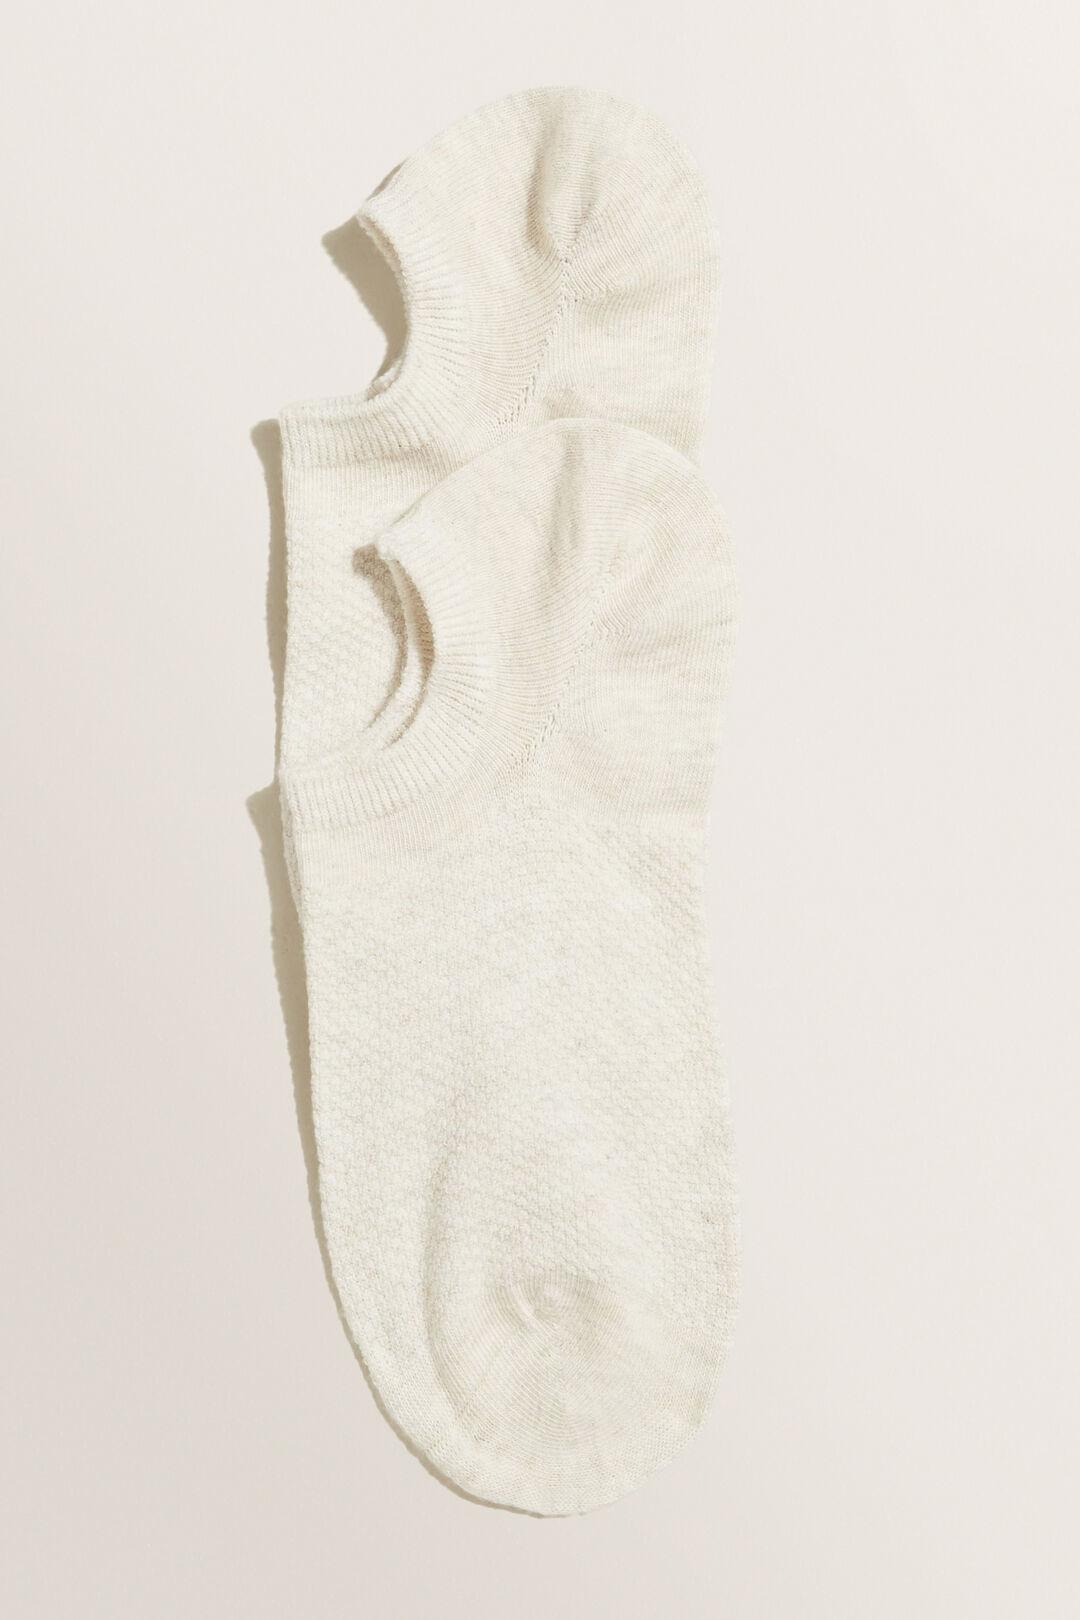 Textured Sneaker Sock  OATMEAL MARLE  hi-res